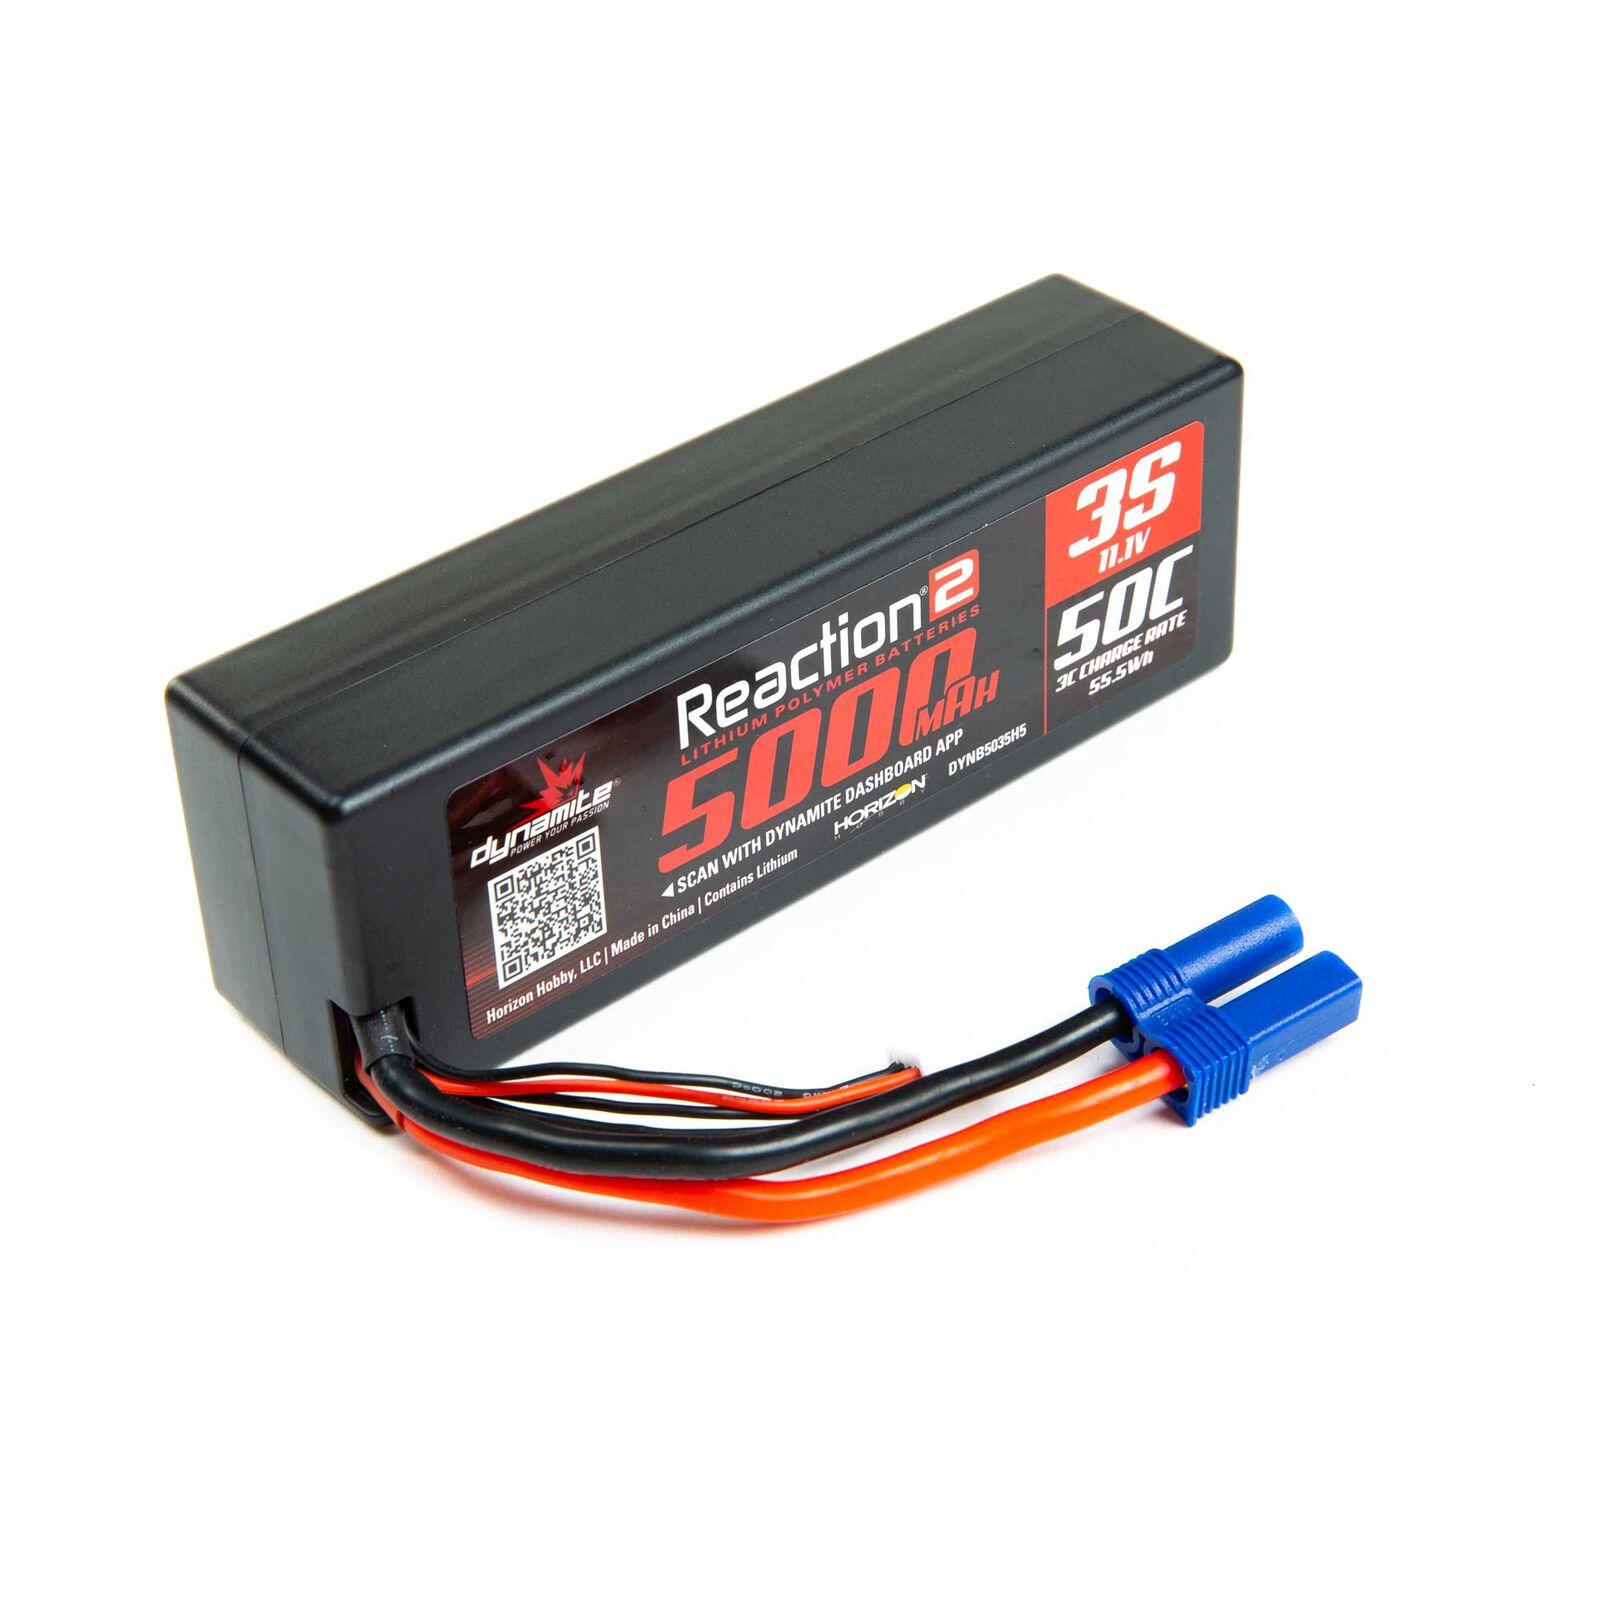 11.1V 5000mAh 3S 50C Reaction 2.0 Hardcase LiPo Battery: EC5